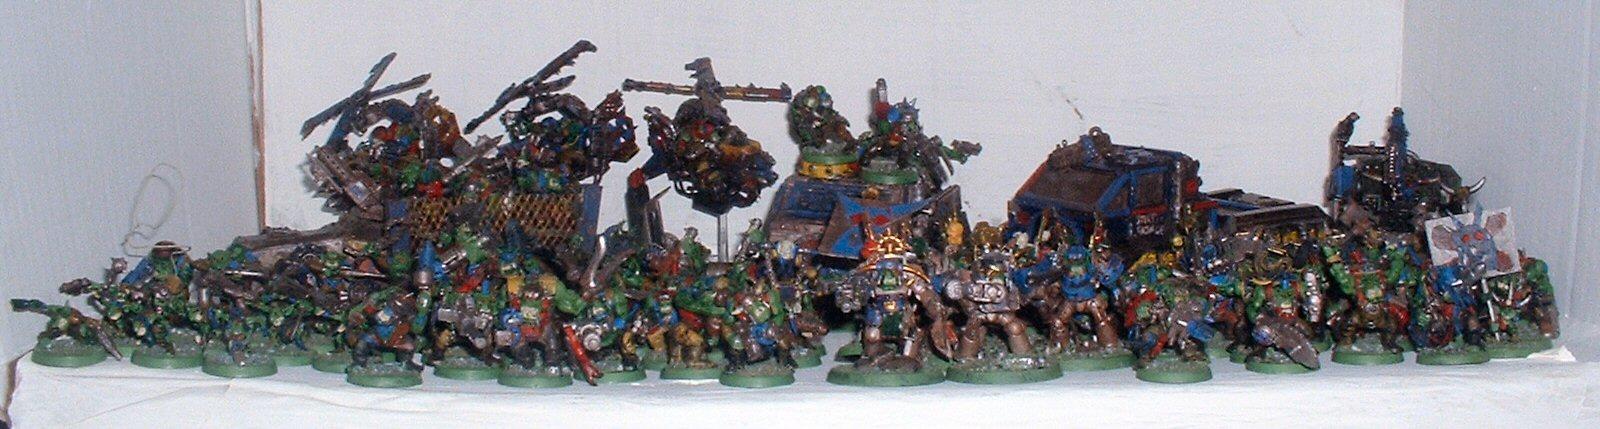 Death Skull, Ork Army, Orks